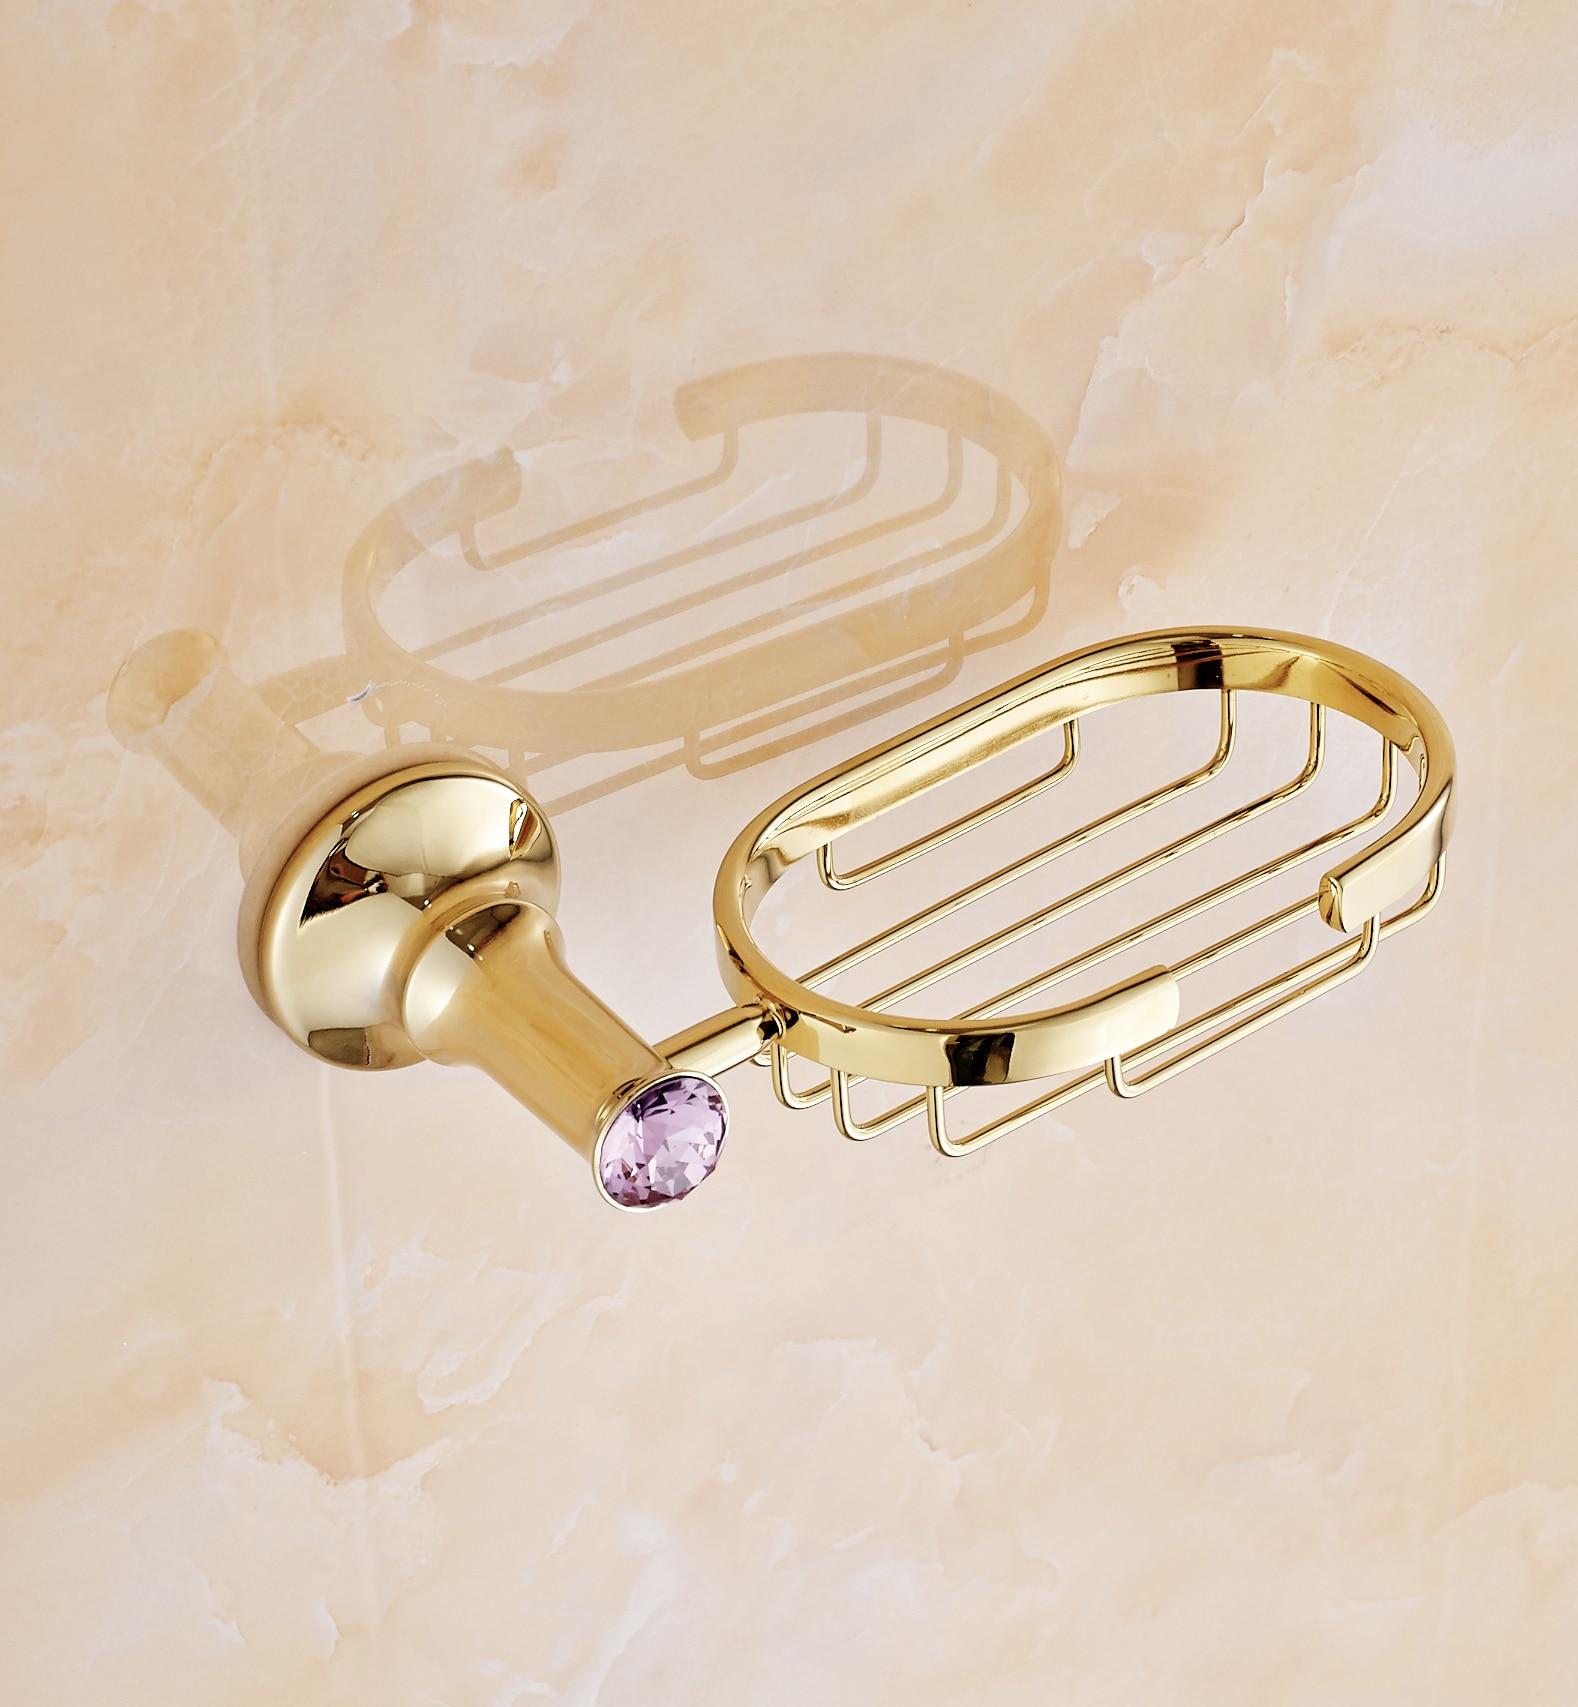 Cheap purple bathroom accessories - Luxury Gold Bathroom Soap Net Antique Brass Storag